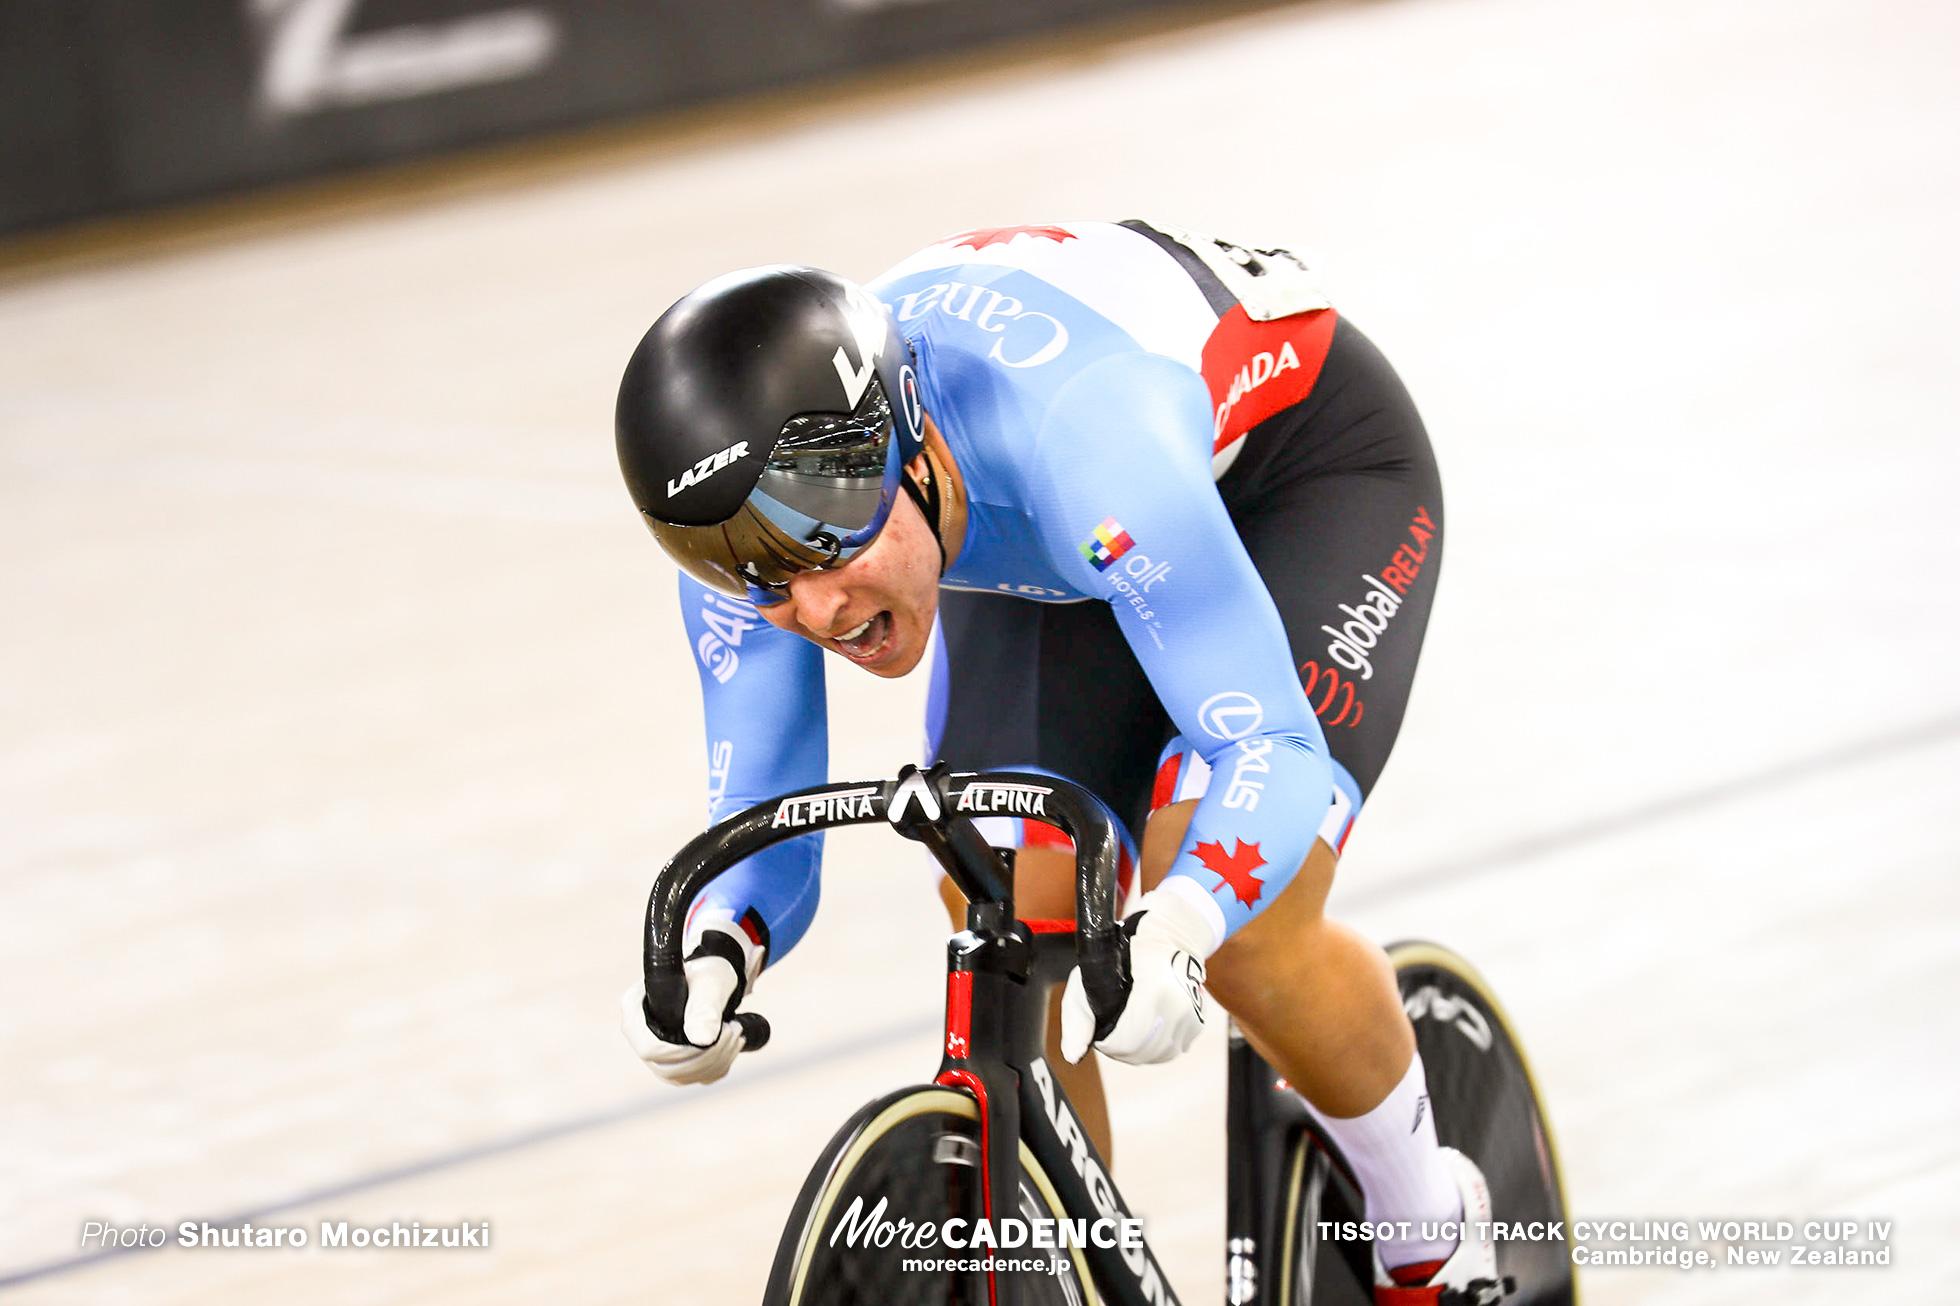 Qualifying / Women's Sprint / TISSOT UCI TRACK CYCLING WORLD CUP IV, Cambridge, New Zealand, Lauriane GENEST ロリアン・ジェネスト